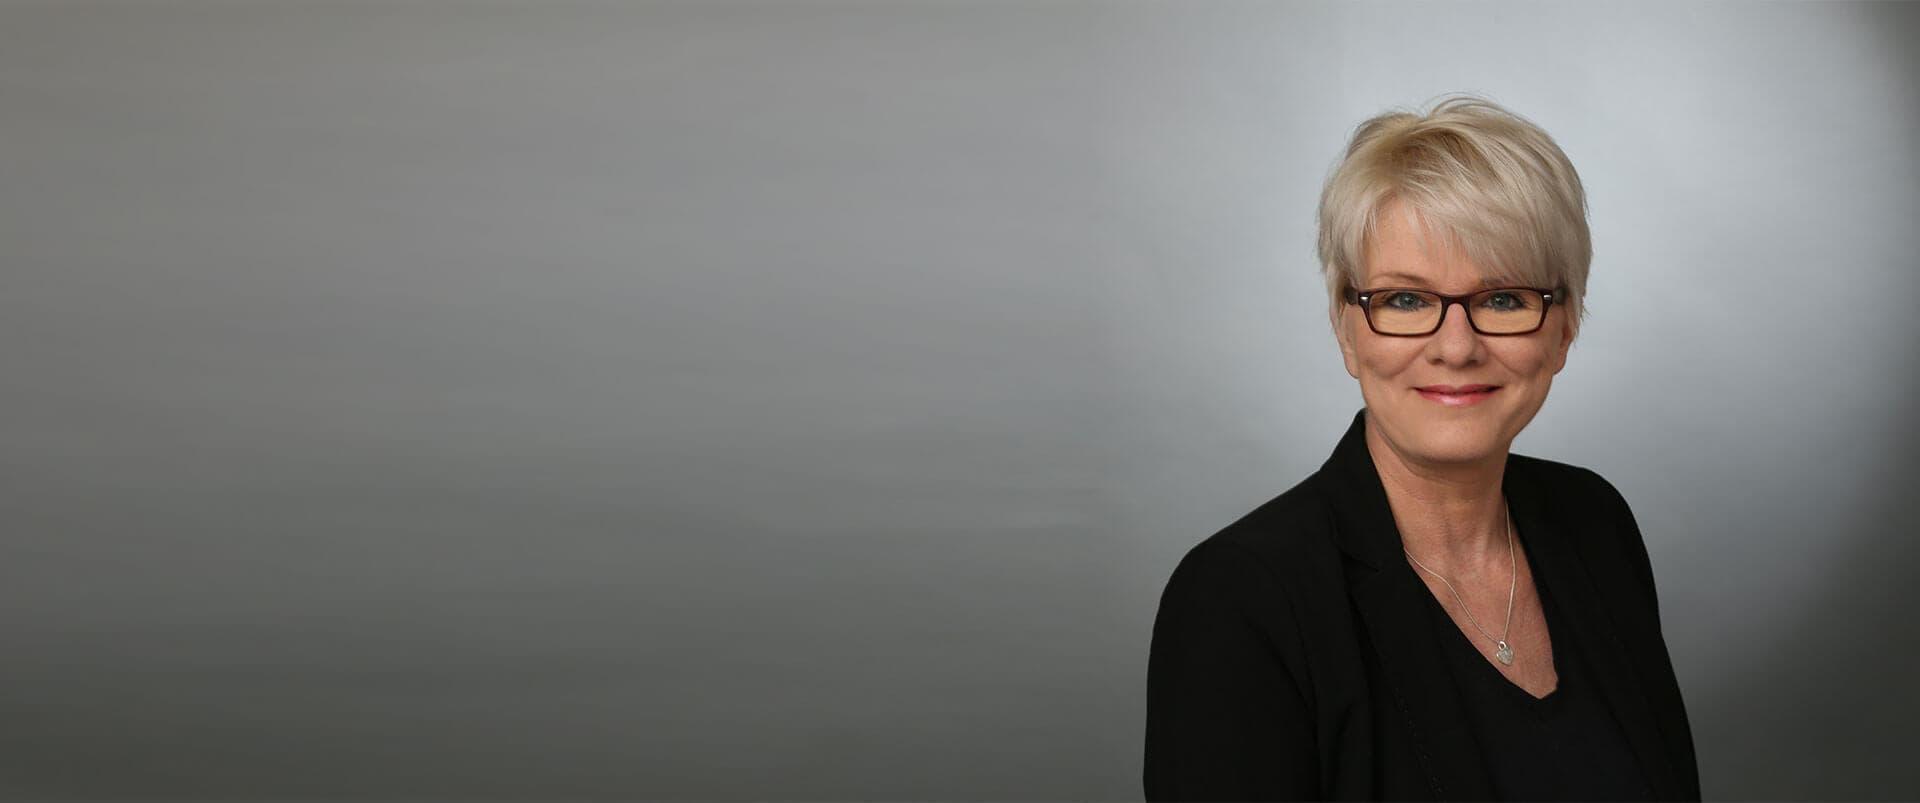 Wiebke Hartmann Portrait